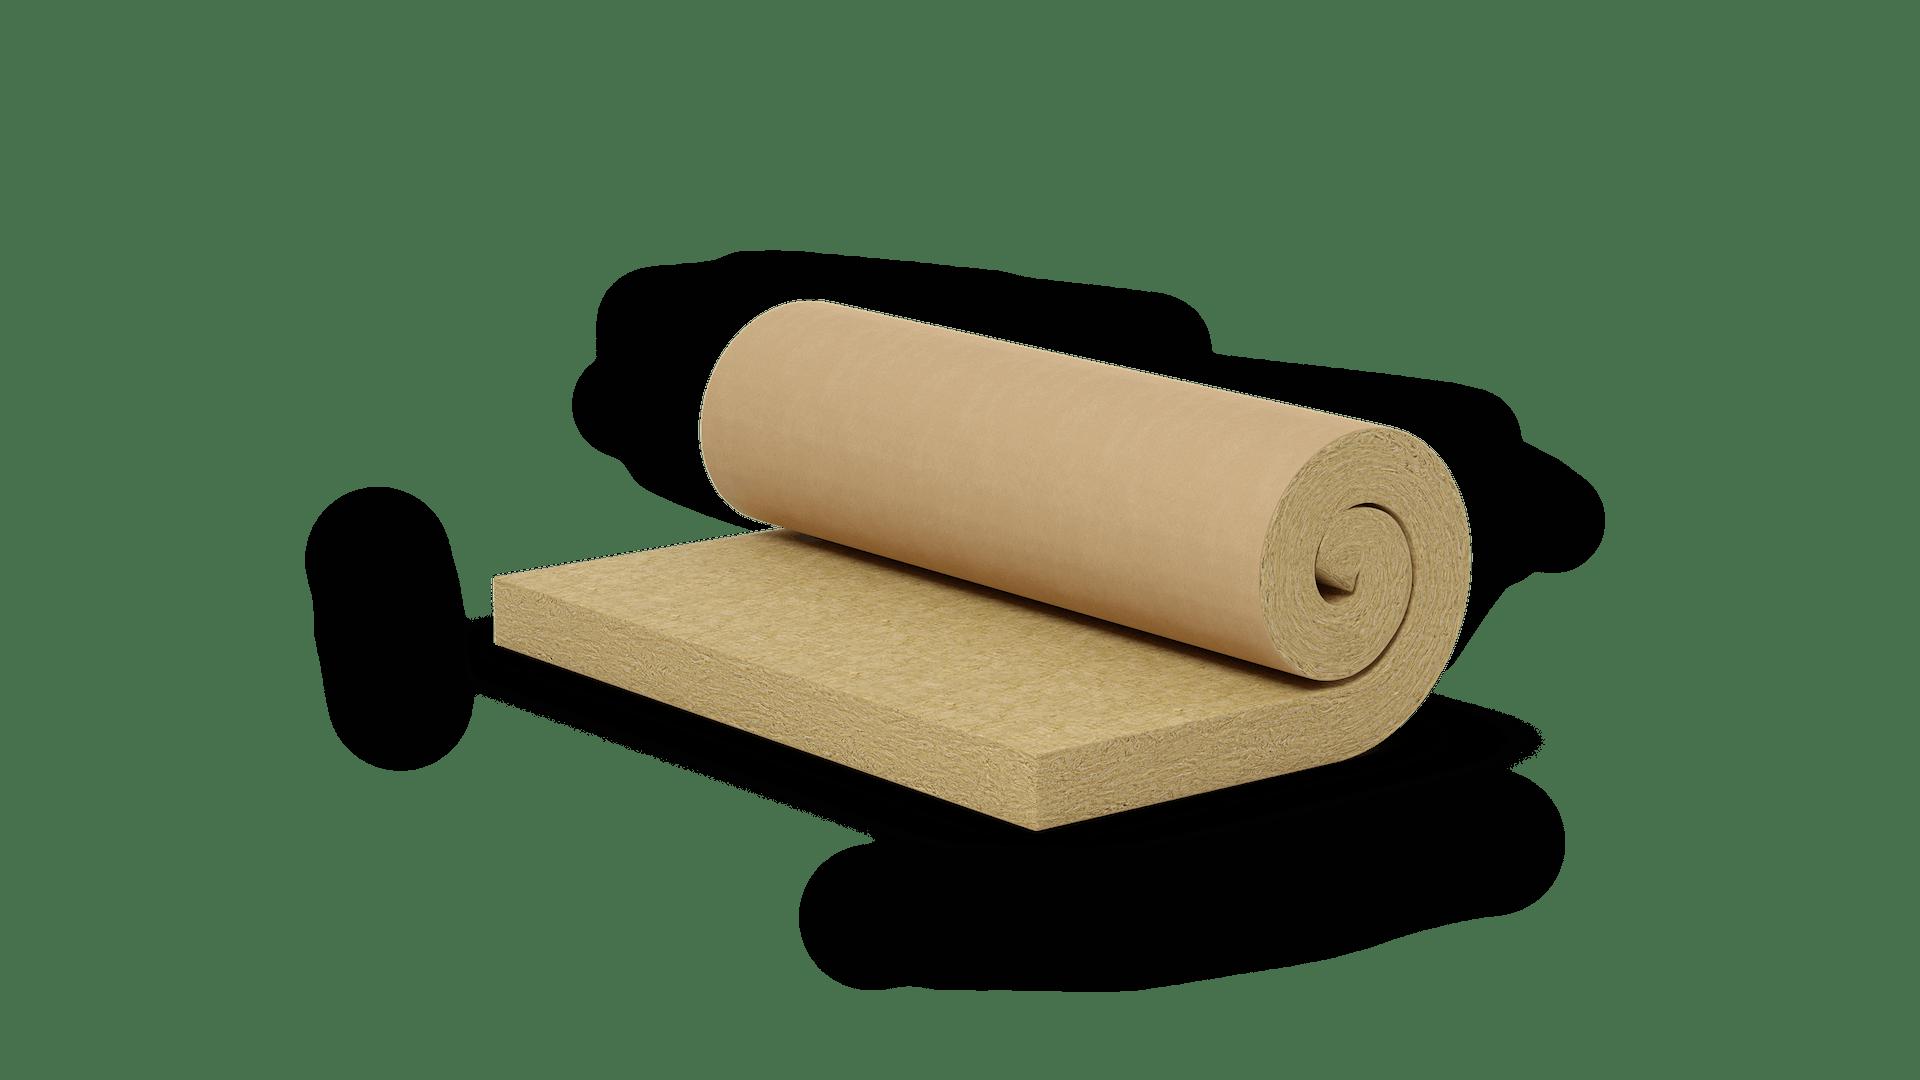 Roll, kraft coated Products: ROULROCK KRAFT,  ROULROCK NU,   ROULROCK KRAFT PERFORE, EASYROCK, TOITROCK KRAFT